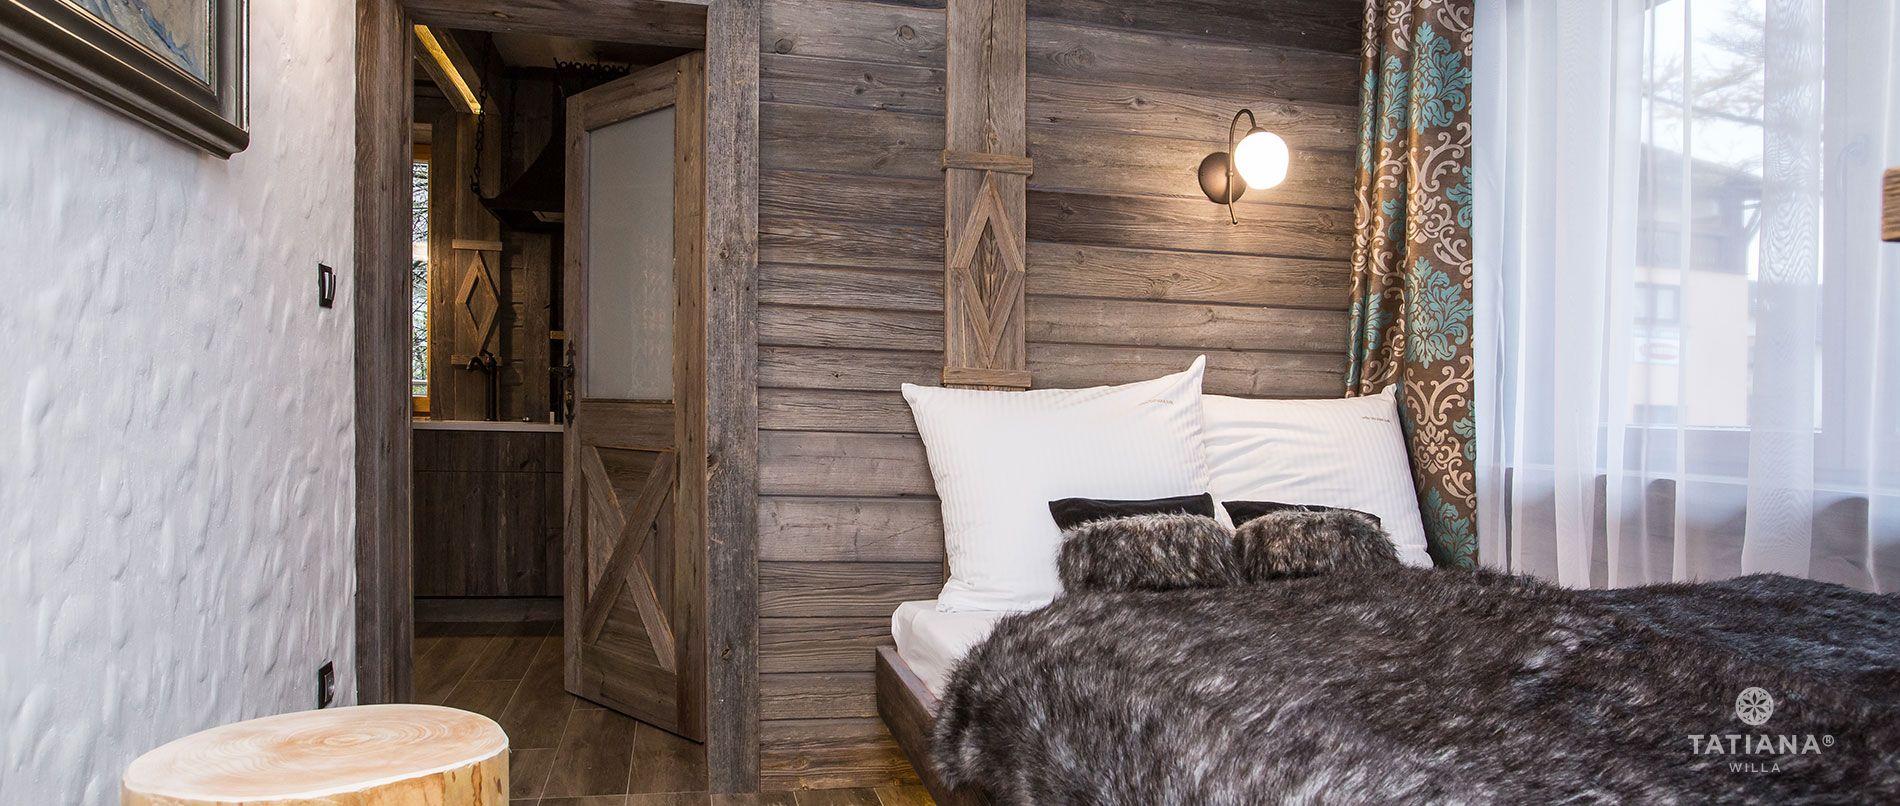 Apartament Syberyjski- sypialnia